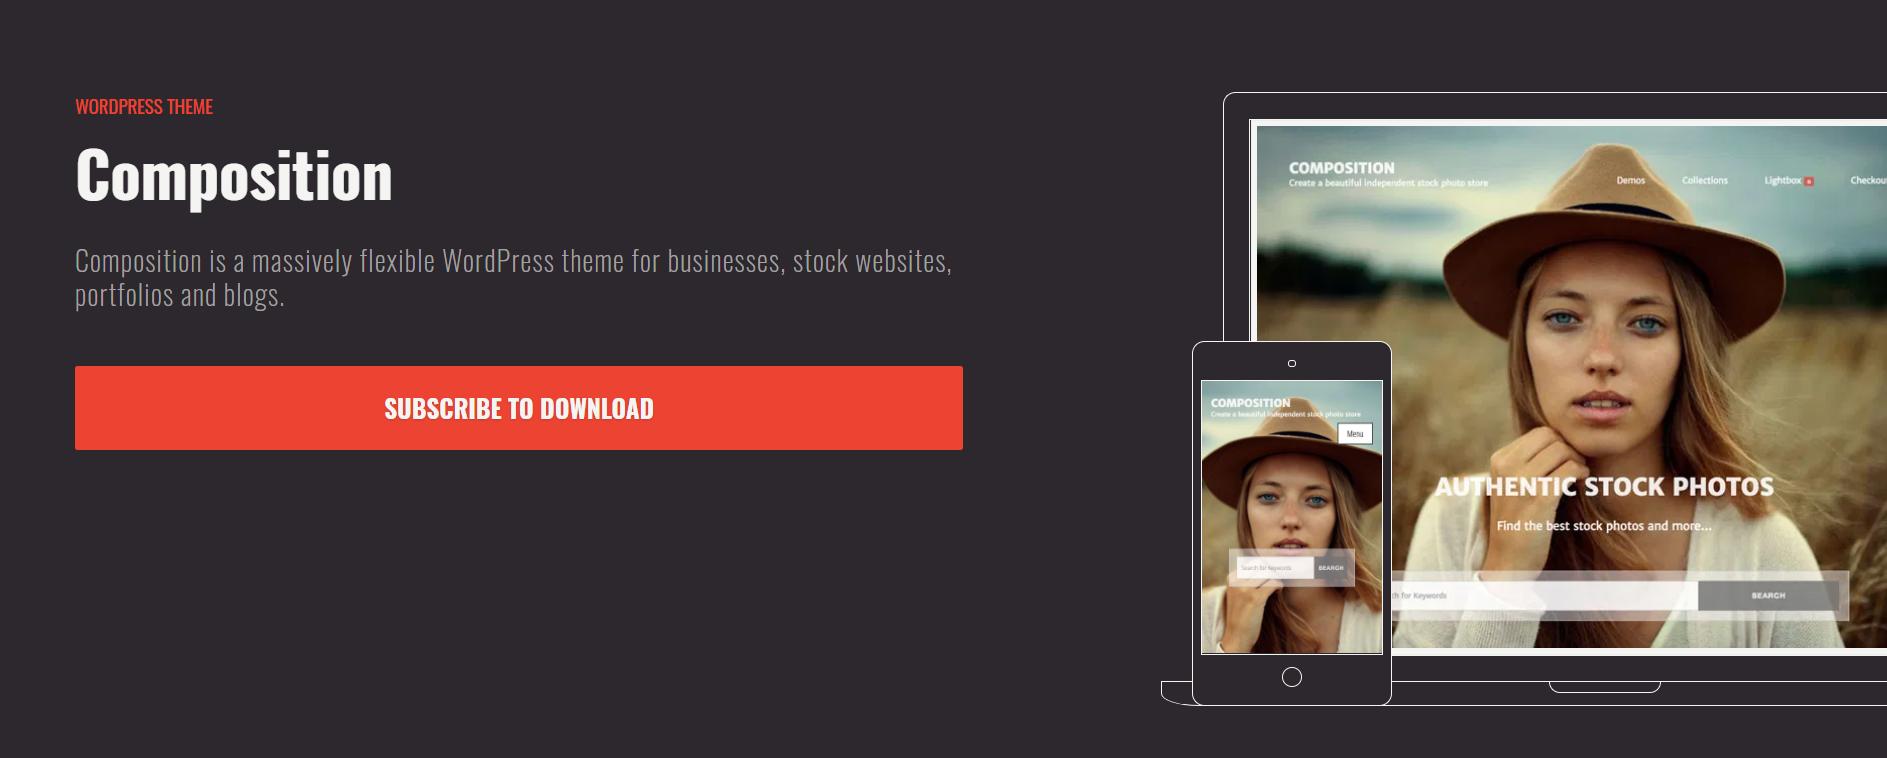 best website themes